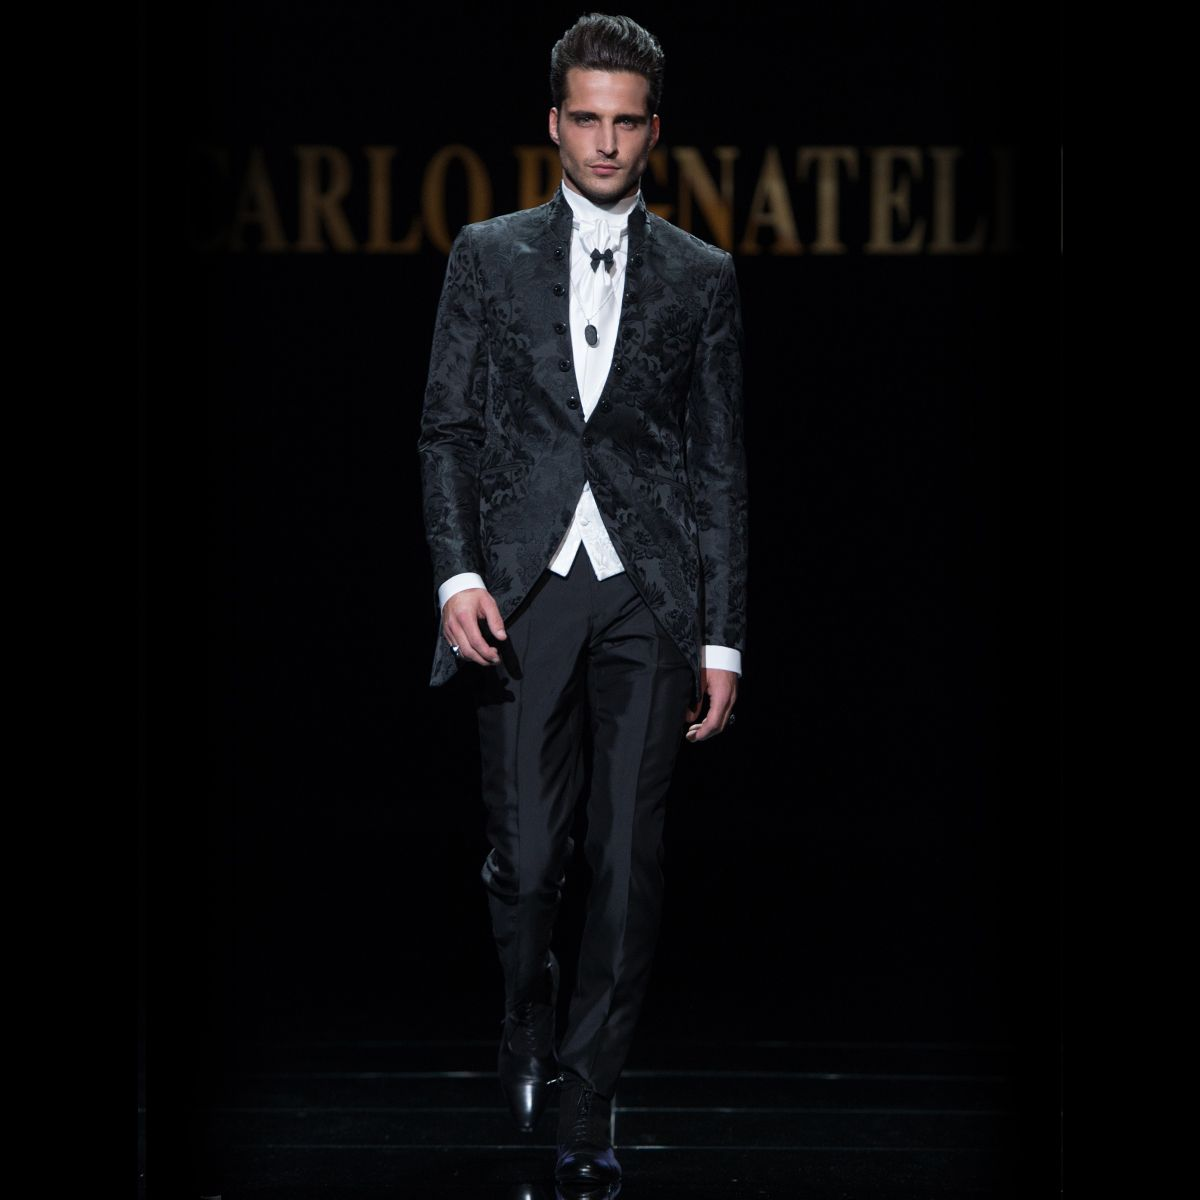 Carlo pignatelli fashion show wedding fashionshow groom